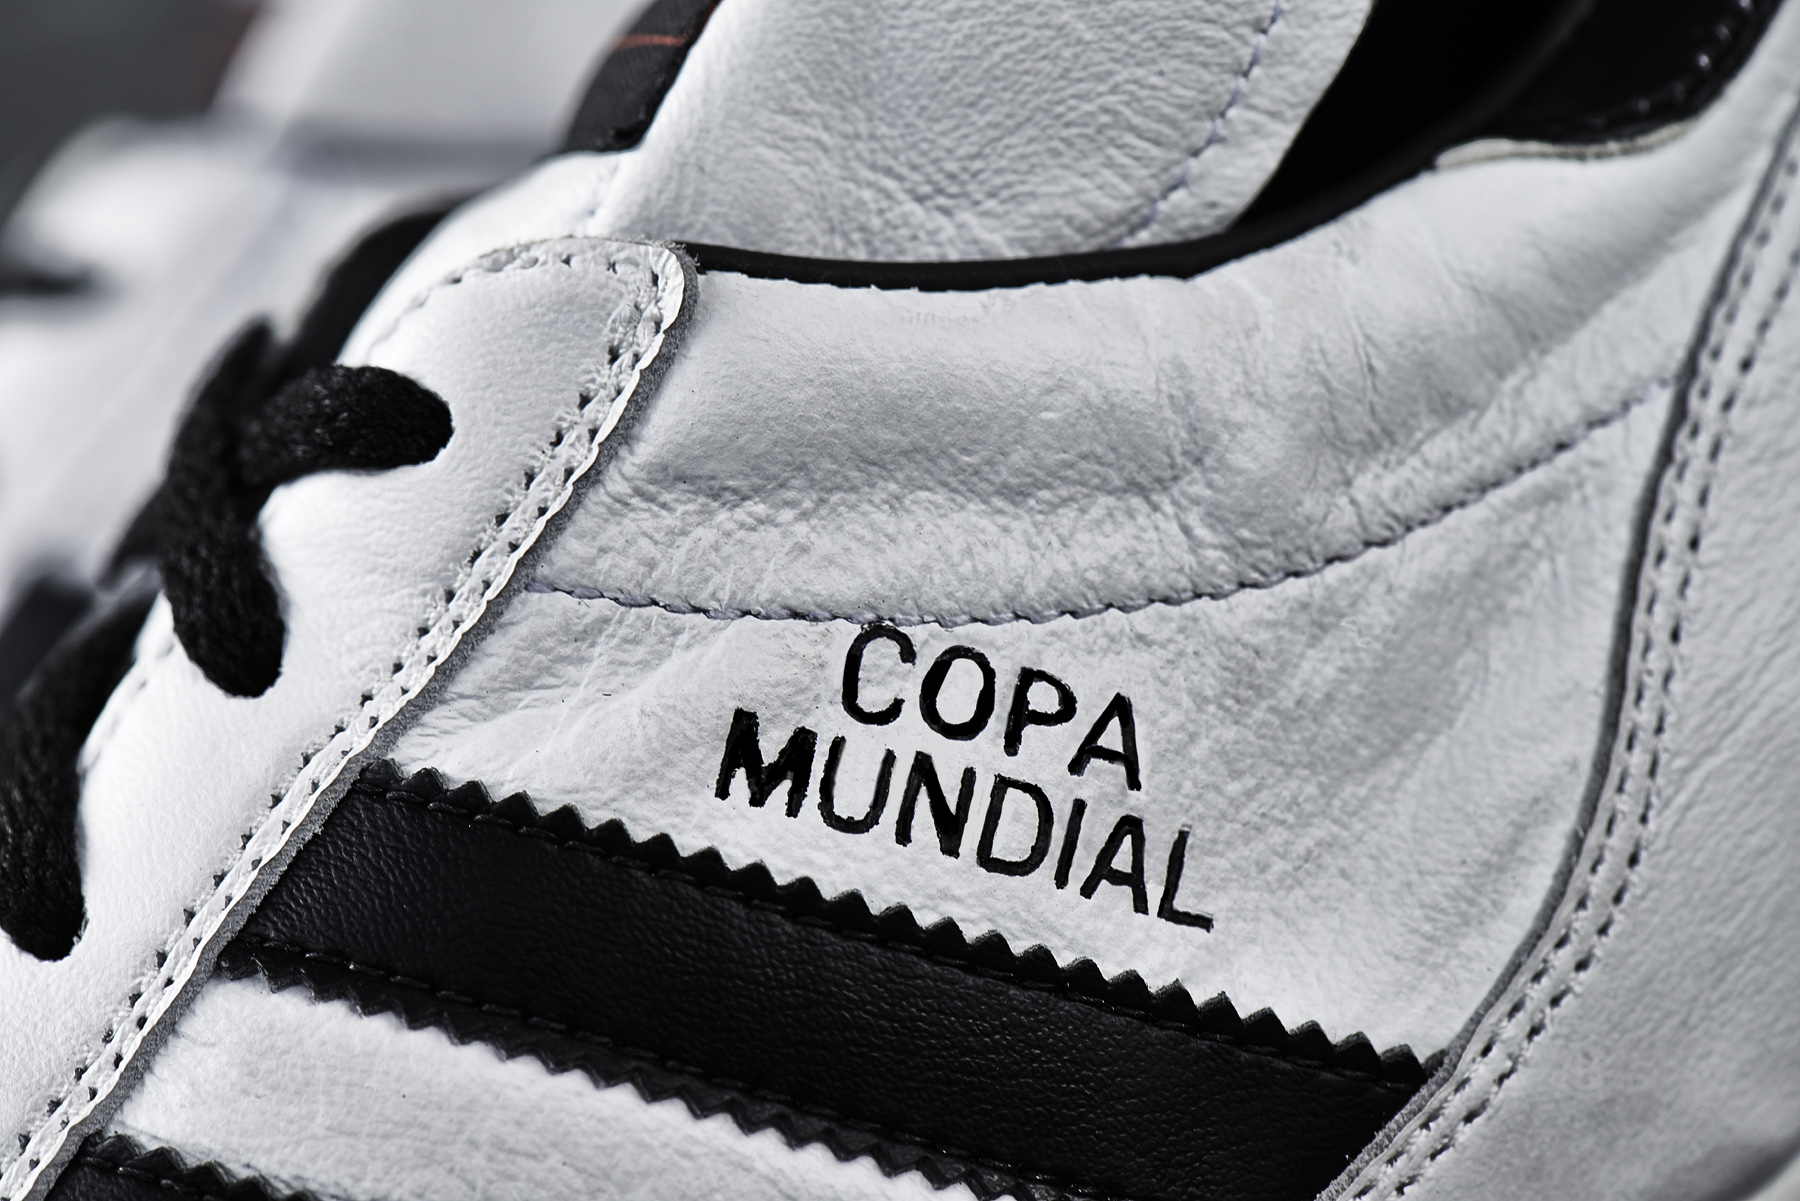 AJS_Adidas_Copa Mundial Pile_0399_AJS_V1.jpg